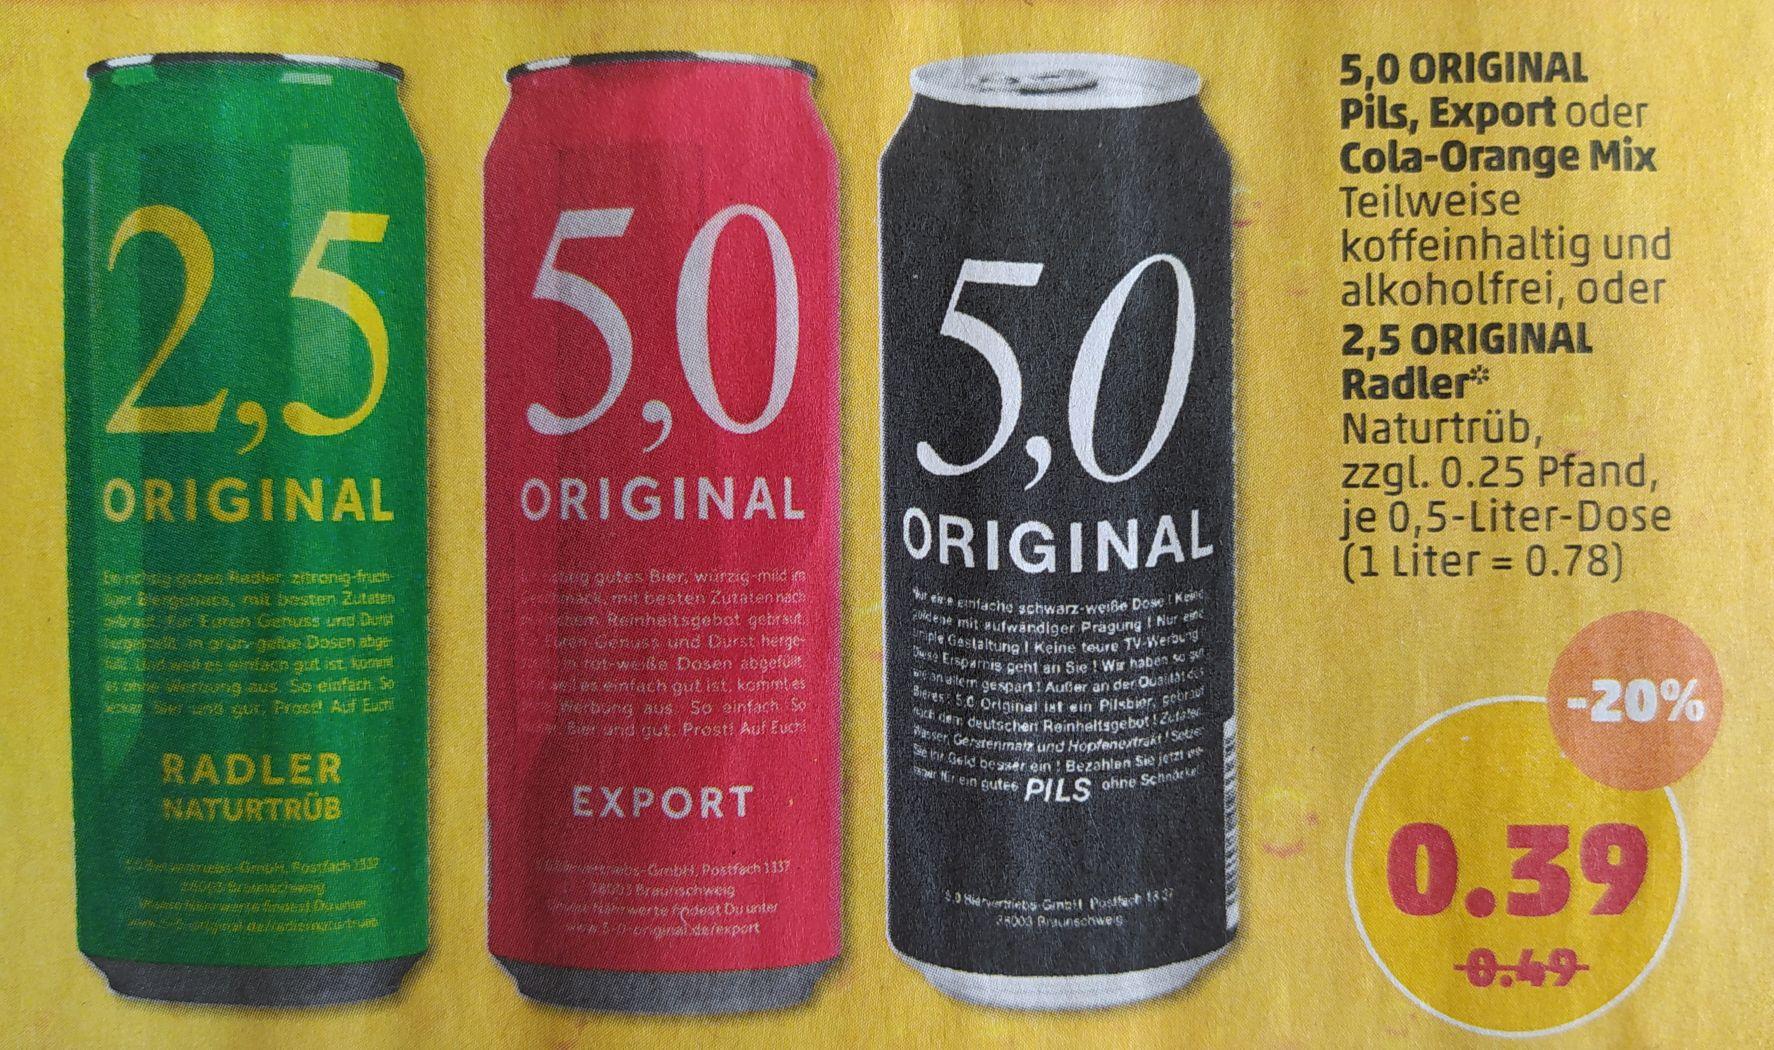 5,0 Original Pils, Export Bier, Cola-Orange Mix und 2,5 Original Radler für 39 Cent ab 22.04. [Penny]